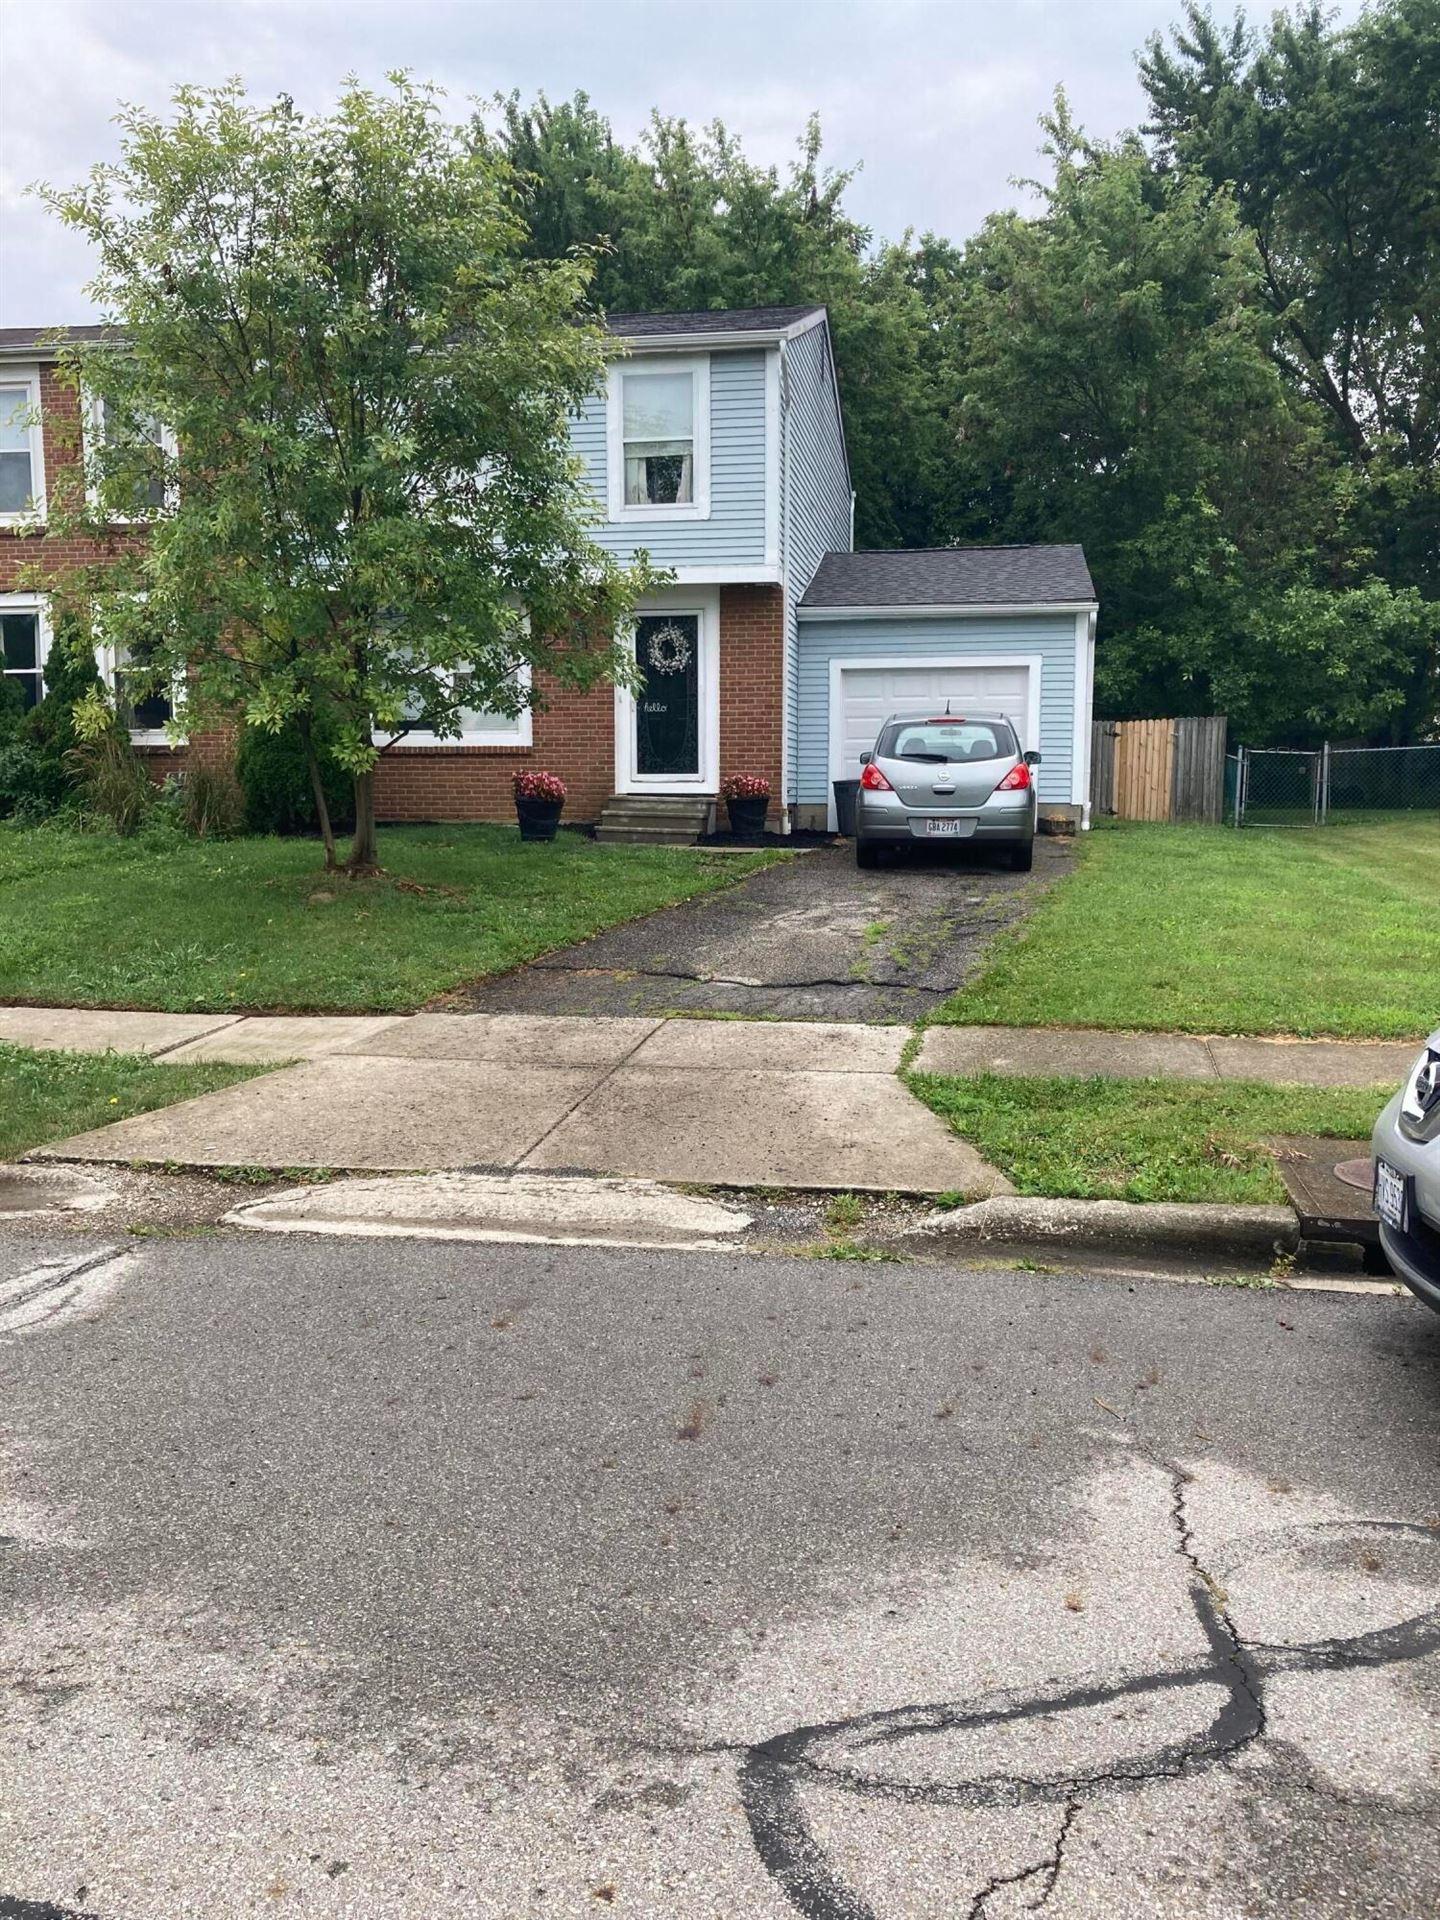 Photo of 8814 Creve Coeur Lane, Powell, OH 43065 (MLS # 221029129)